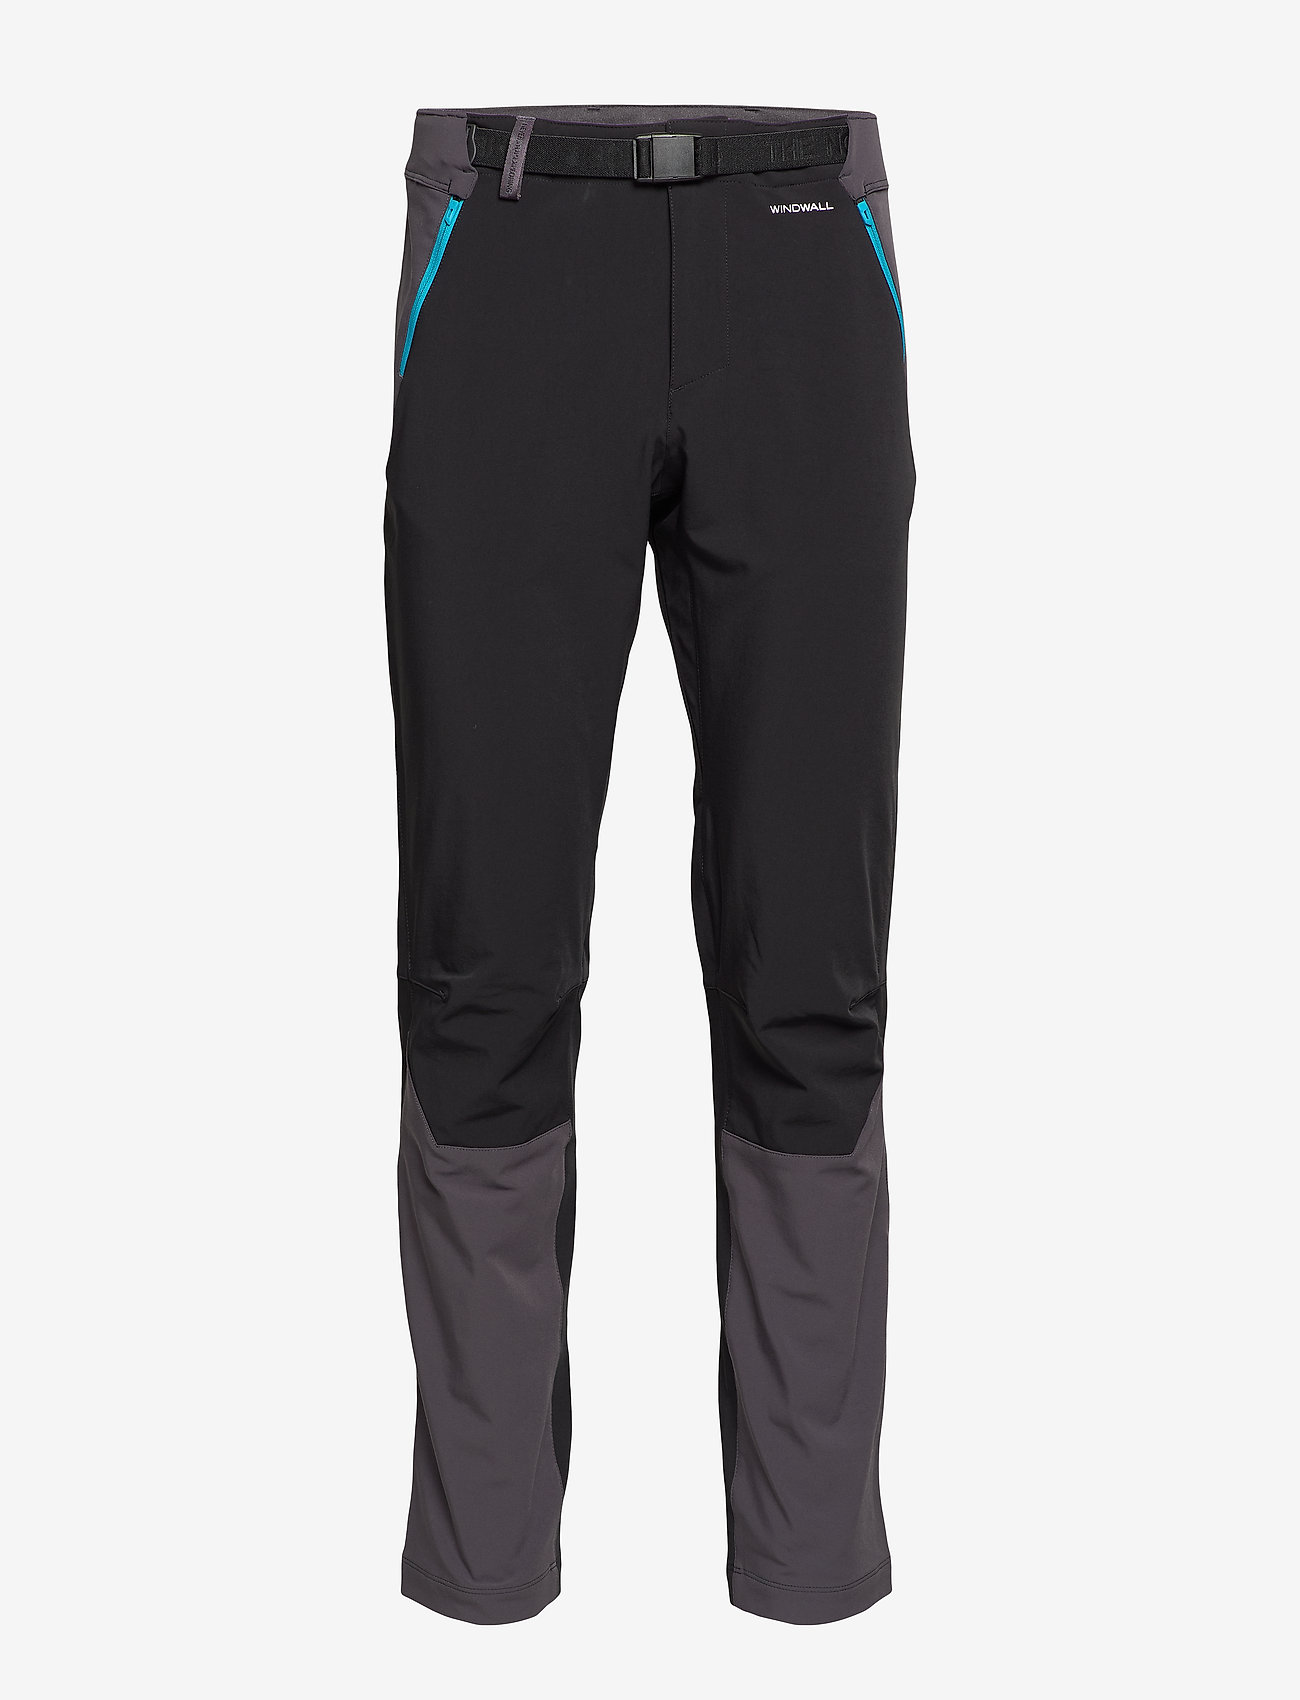 The North Face - M DIABLO II PANT - softshell pants - tnf black/acous - 0